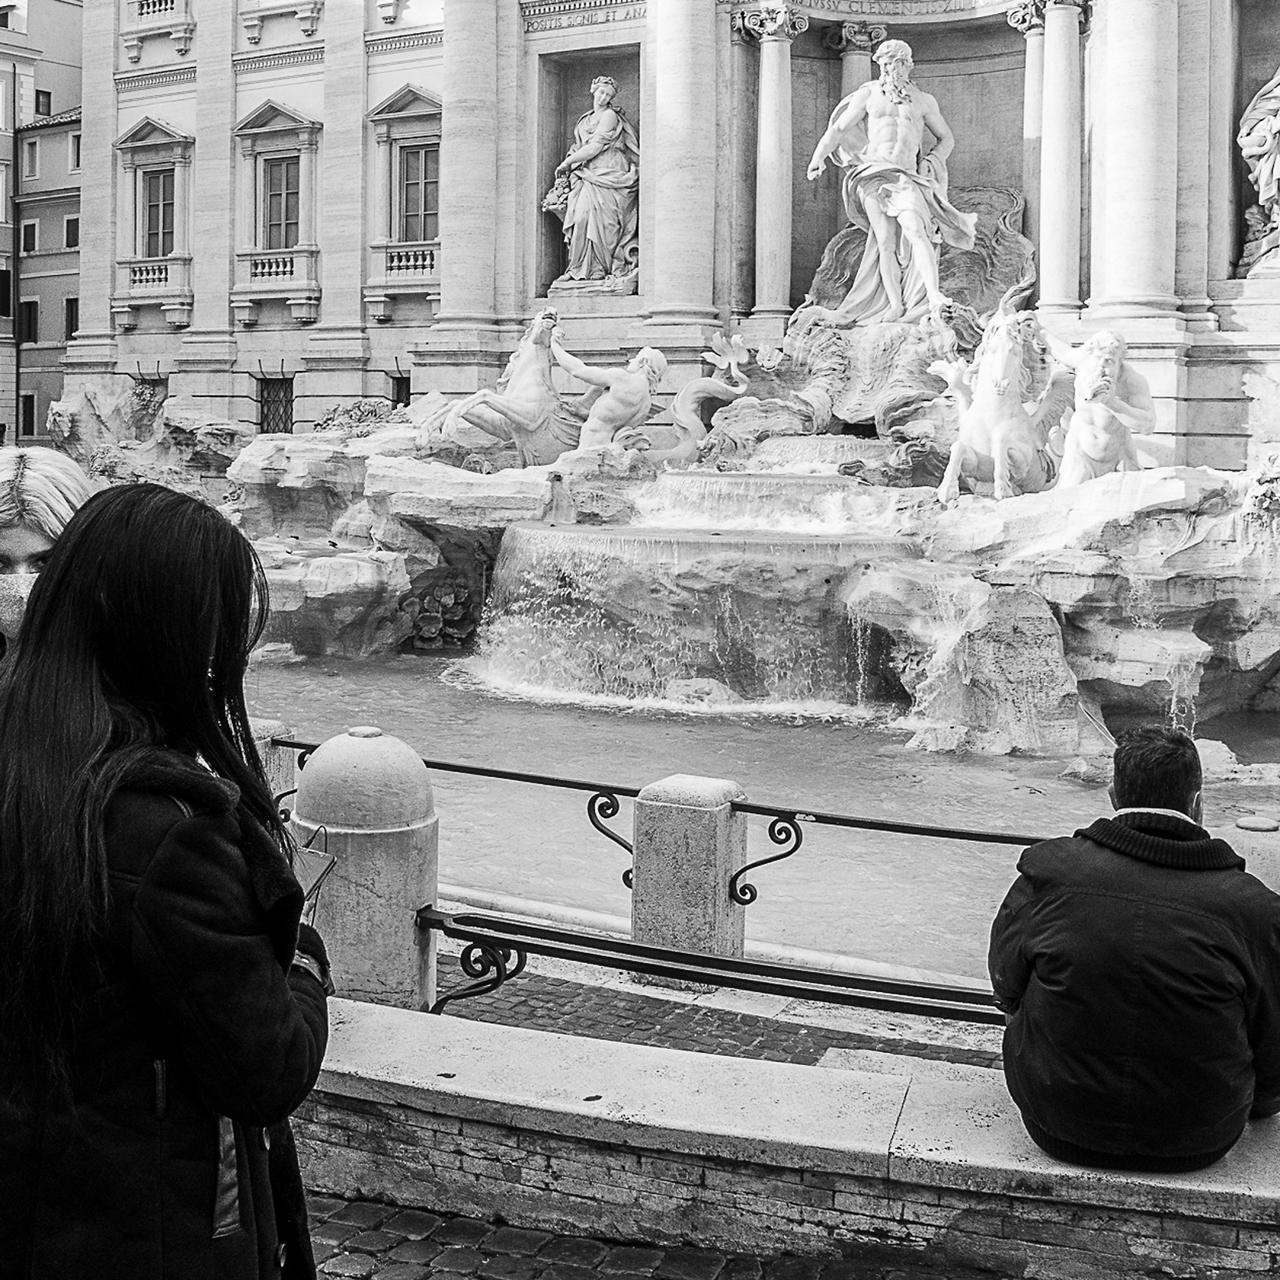 Maniero Rocca Street Photographer